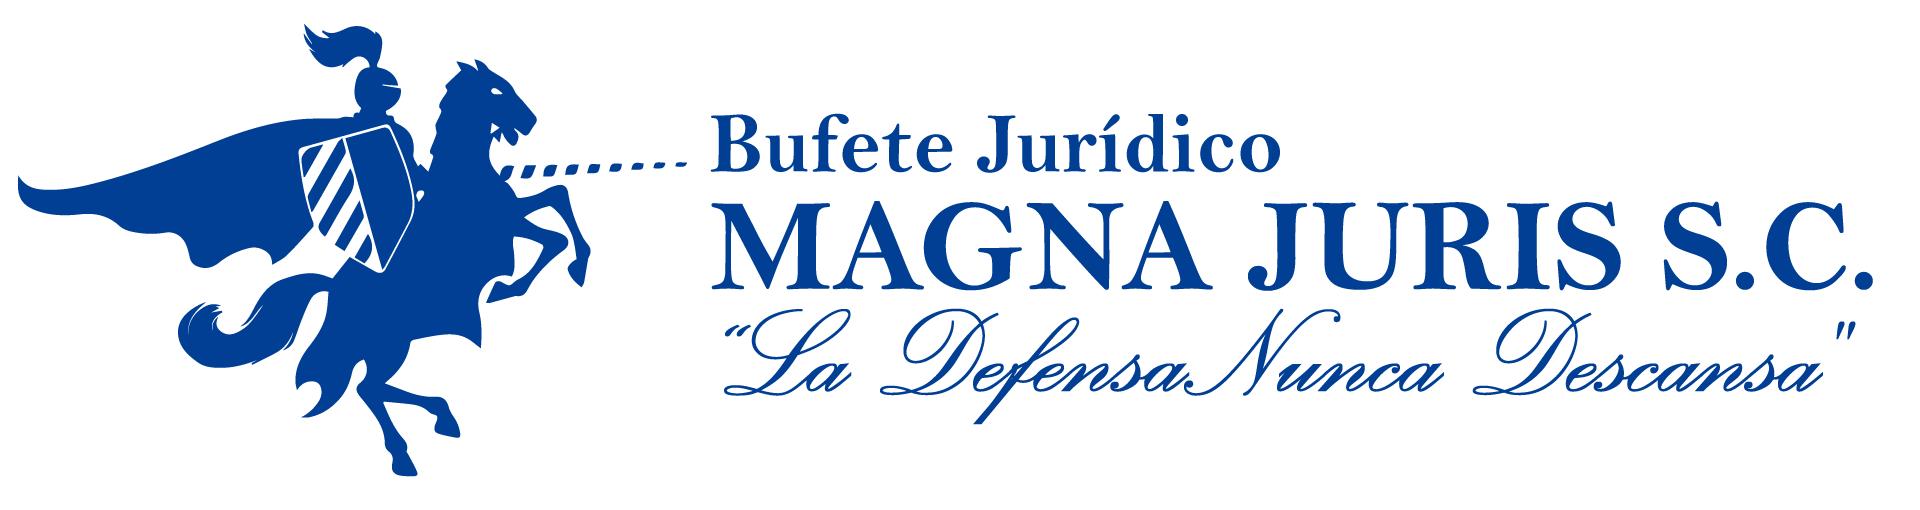 Magna Juris International